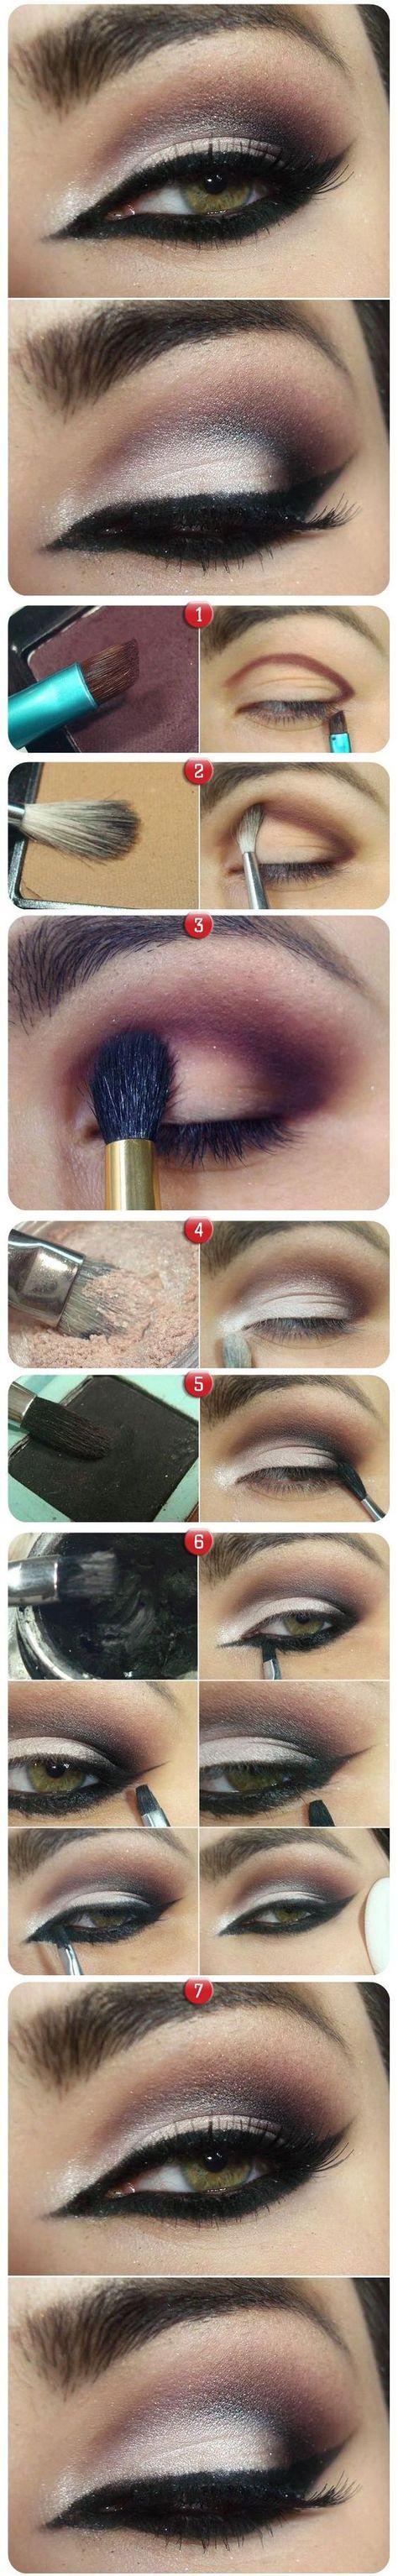 40 Hottest Smokey Eye Makeup Ideas 2021 & Smokey Eye Tutorials for Beginners - Her Style Code